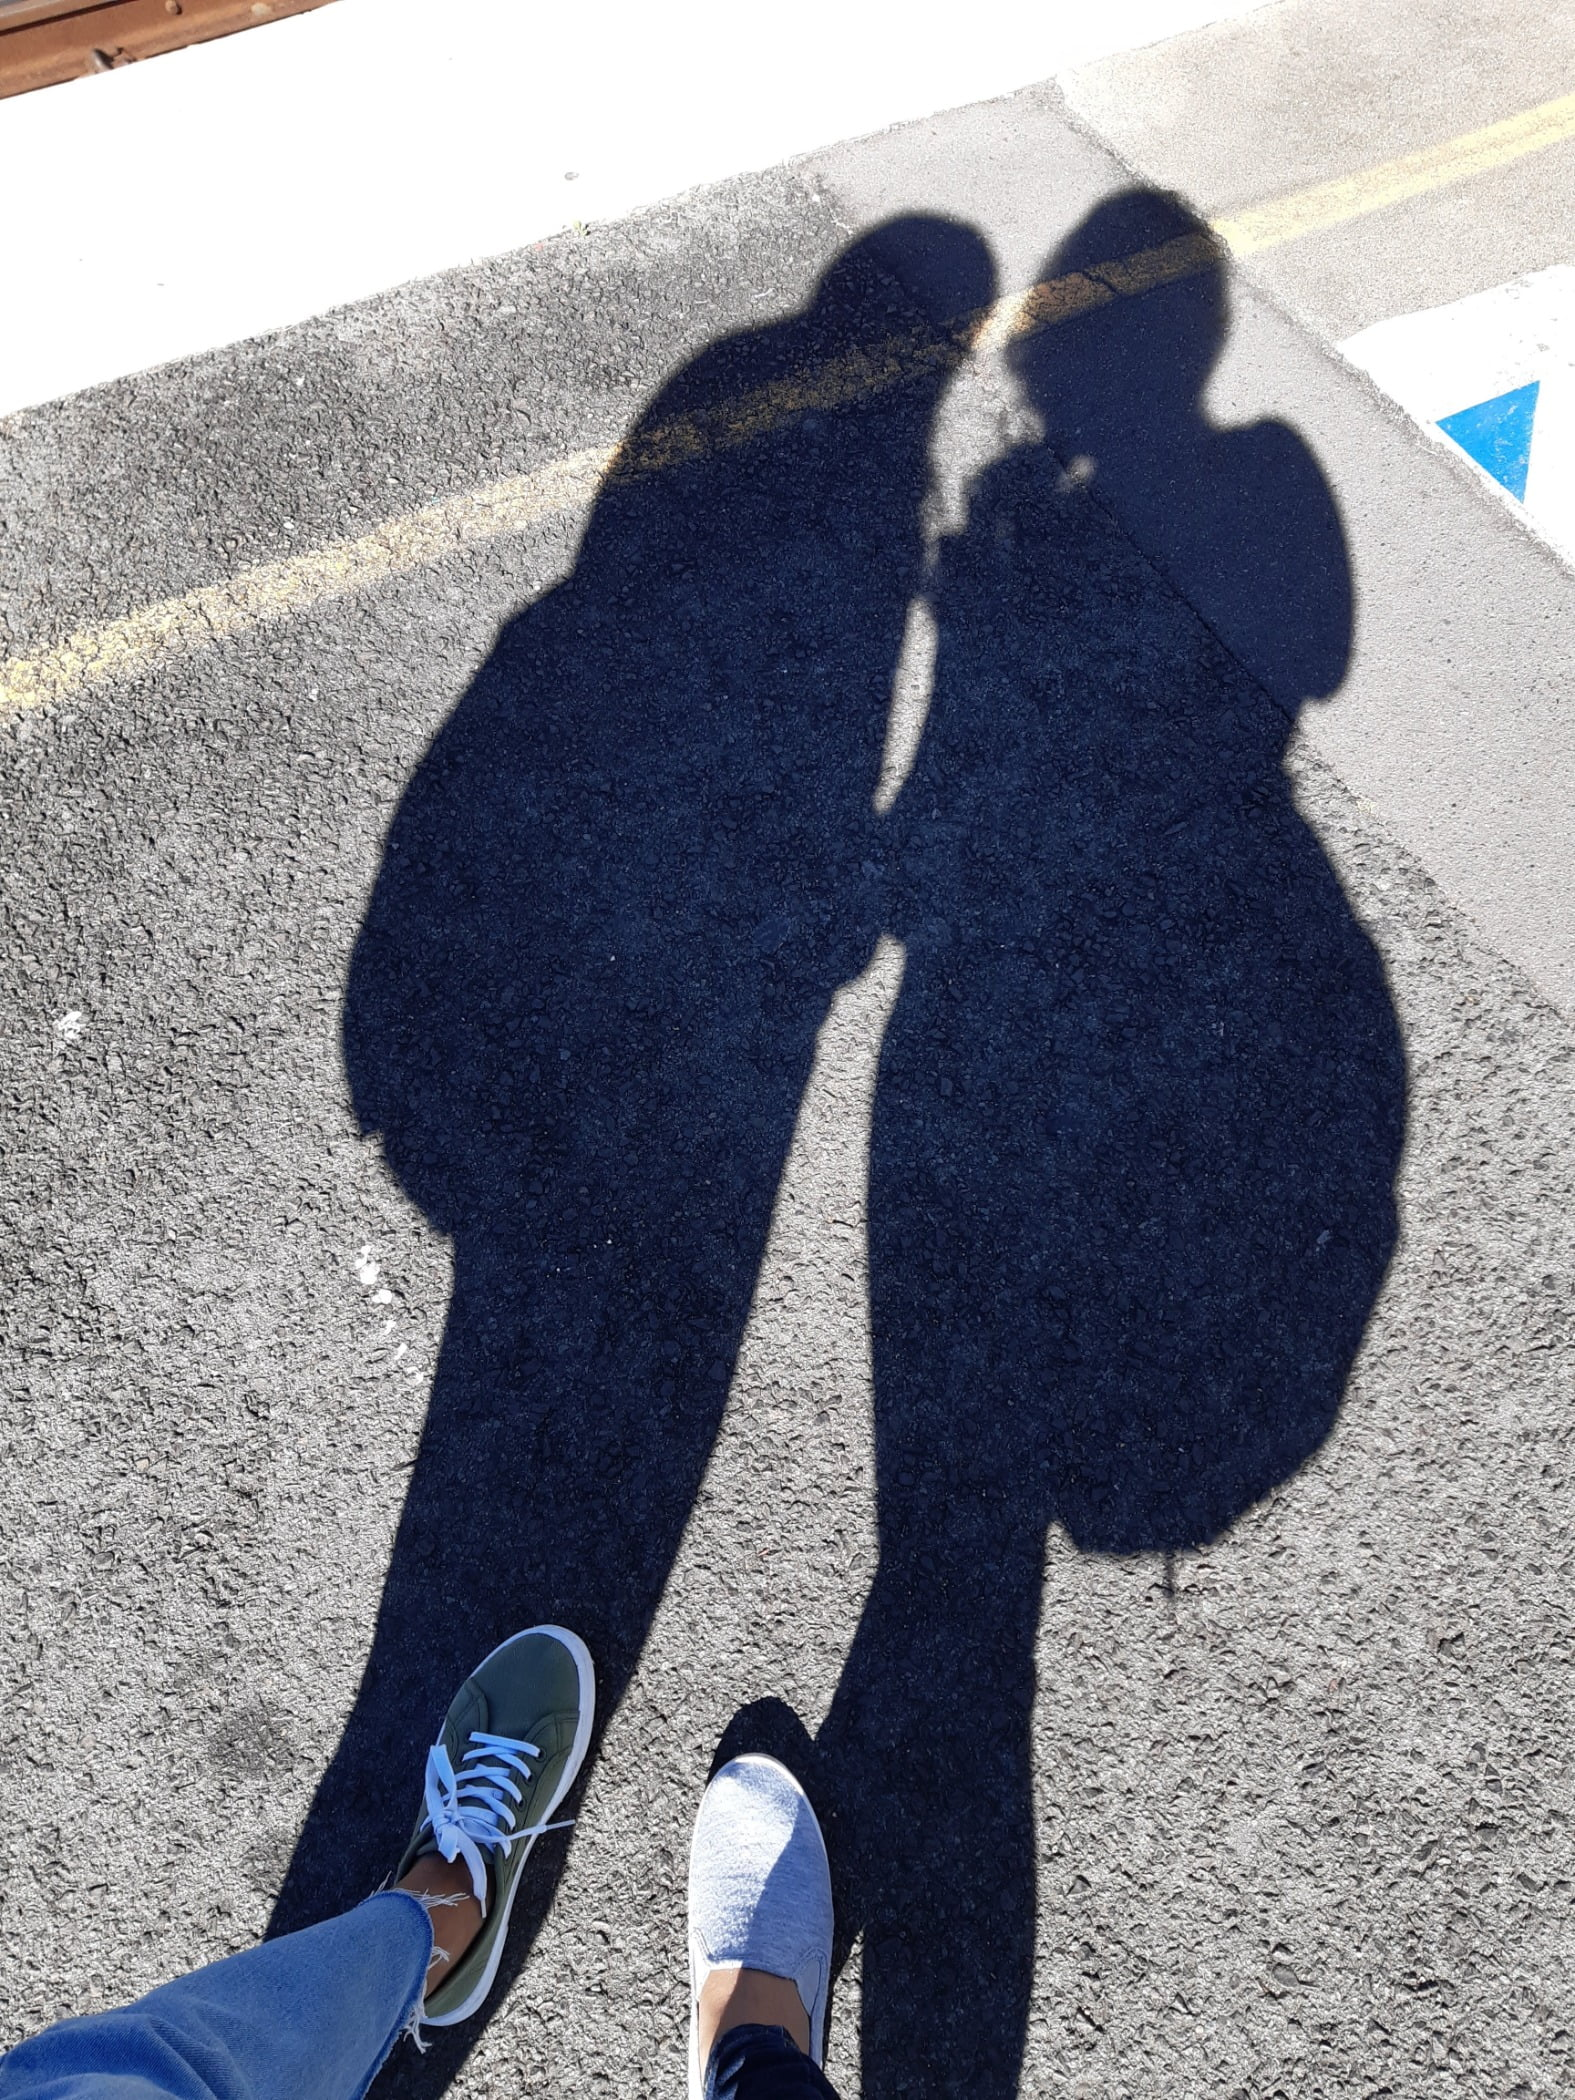 Human body, Road surface, Shoe, Photograph, Leg, White, Blue, Light, Black, Azure